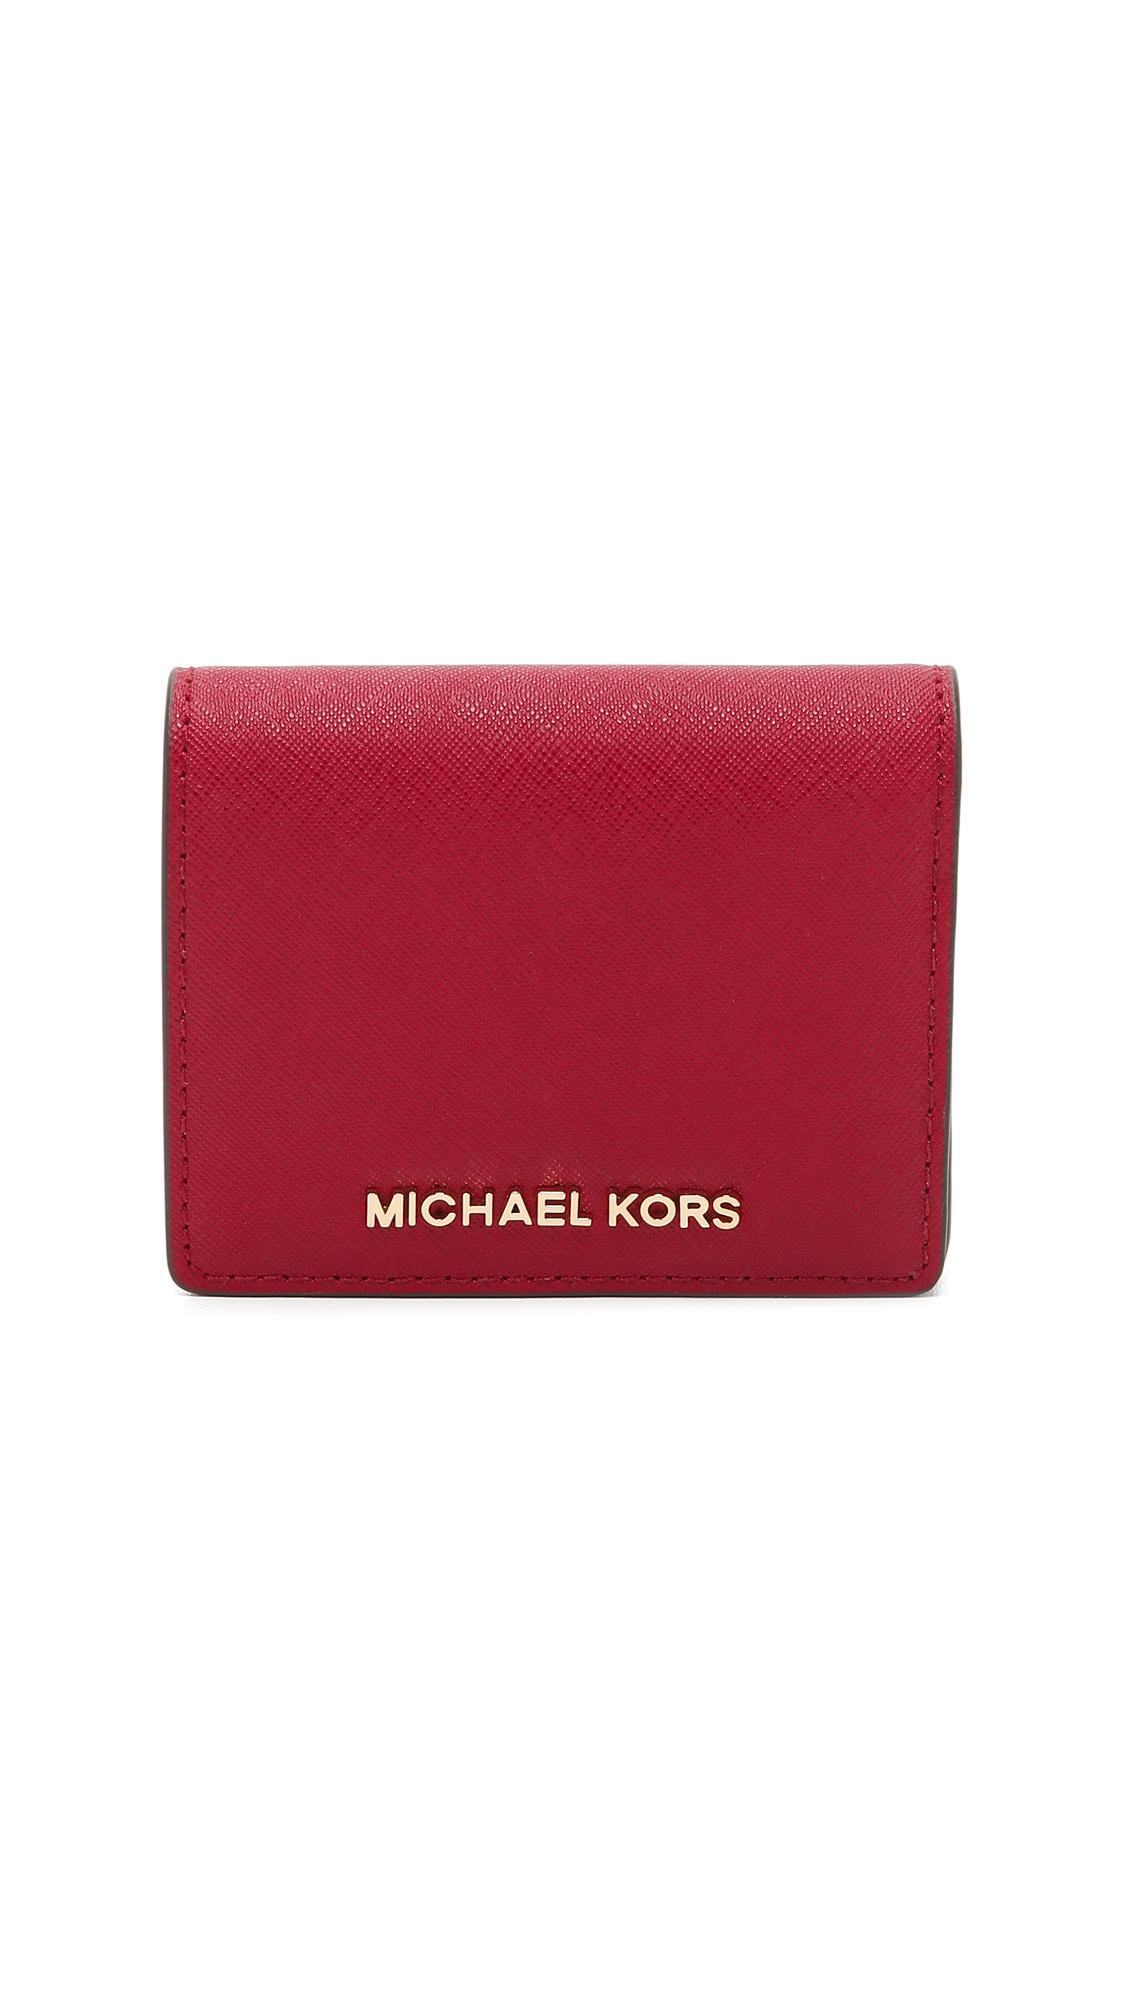 cccebca6196a ... new zealand lyst michael michael kors jet set bifold wallet cherry in  red fb4e6 ef2c5 ...